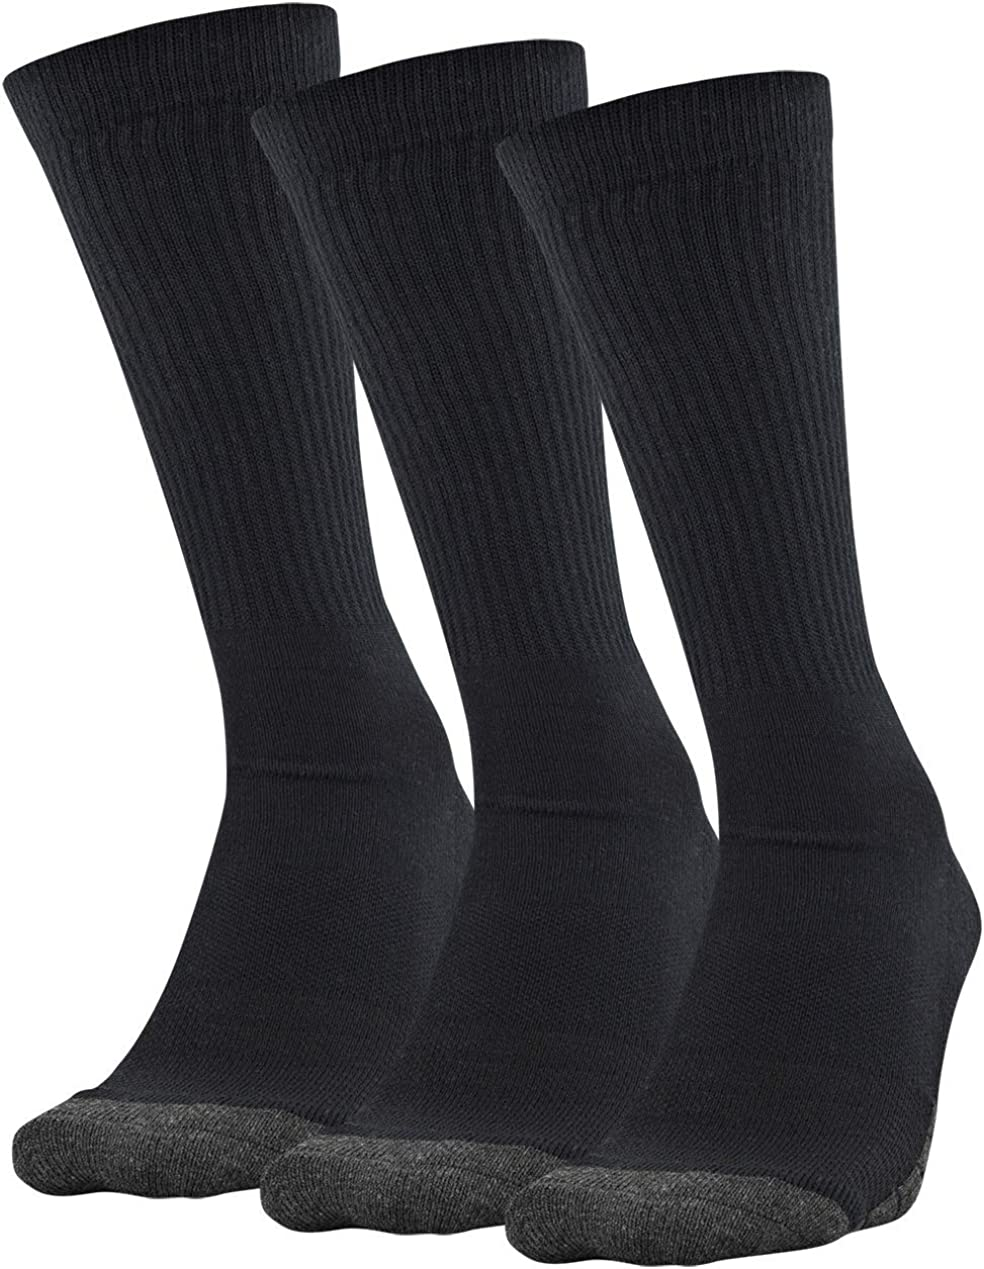 Performance Tech No Show Socks Choose SZ//Color 6 Pairs